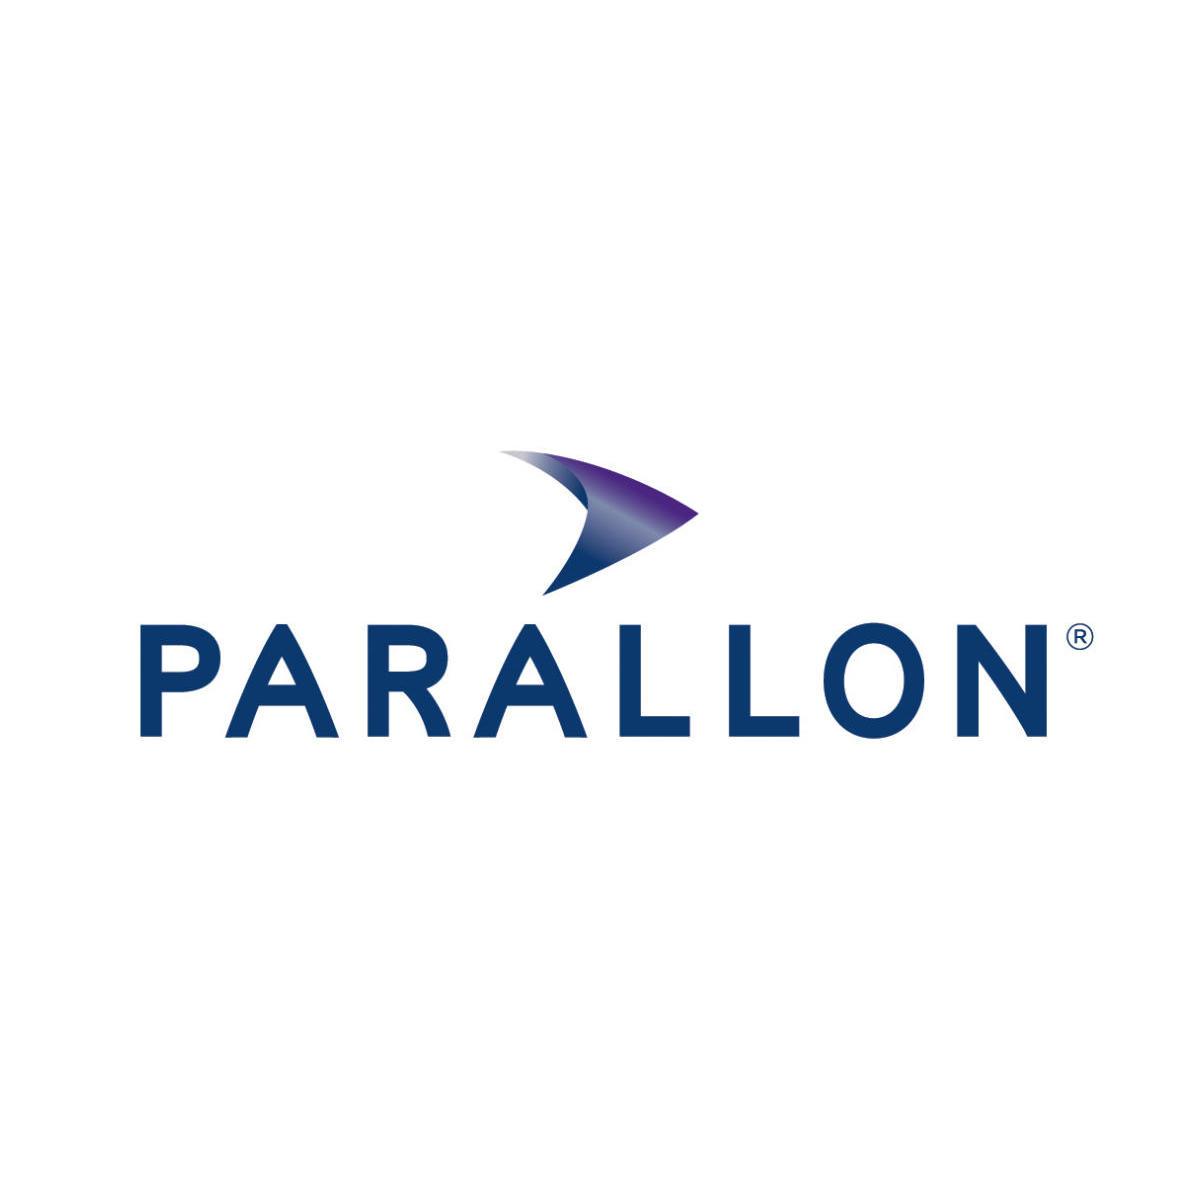 Parallon - Glastonbury Specialty Center